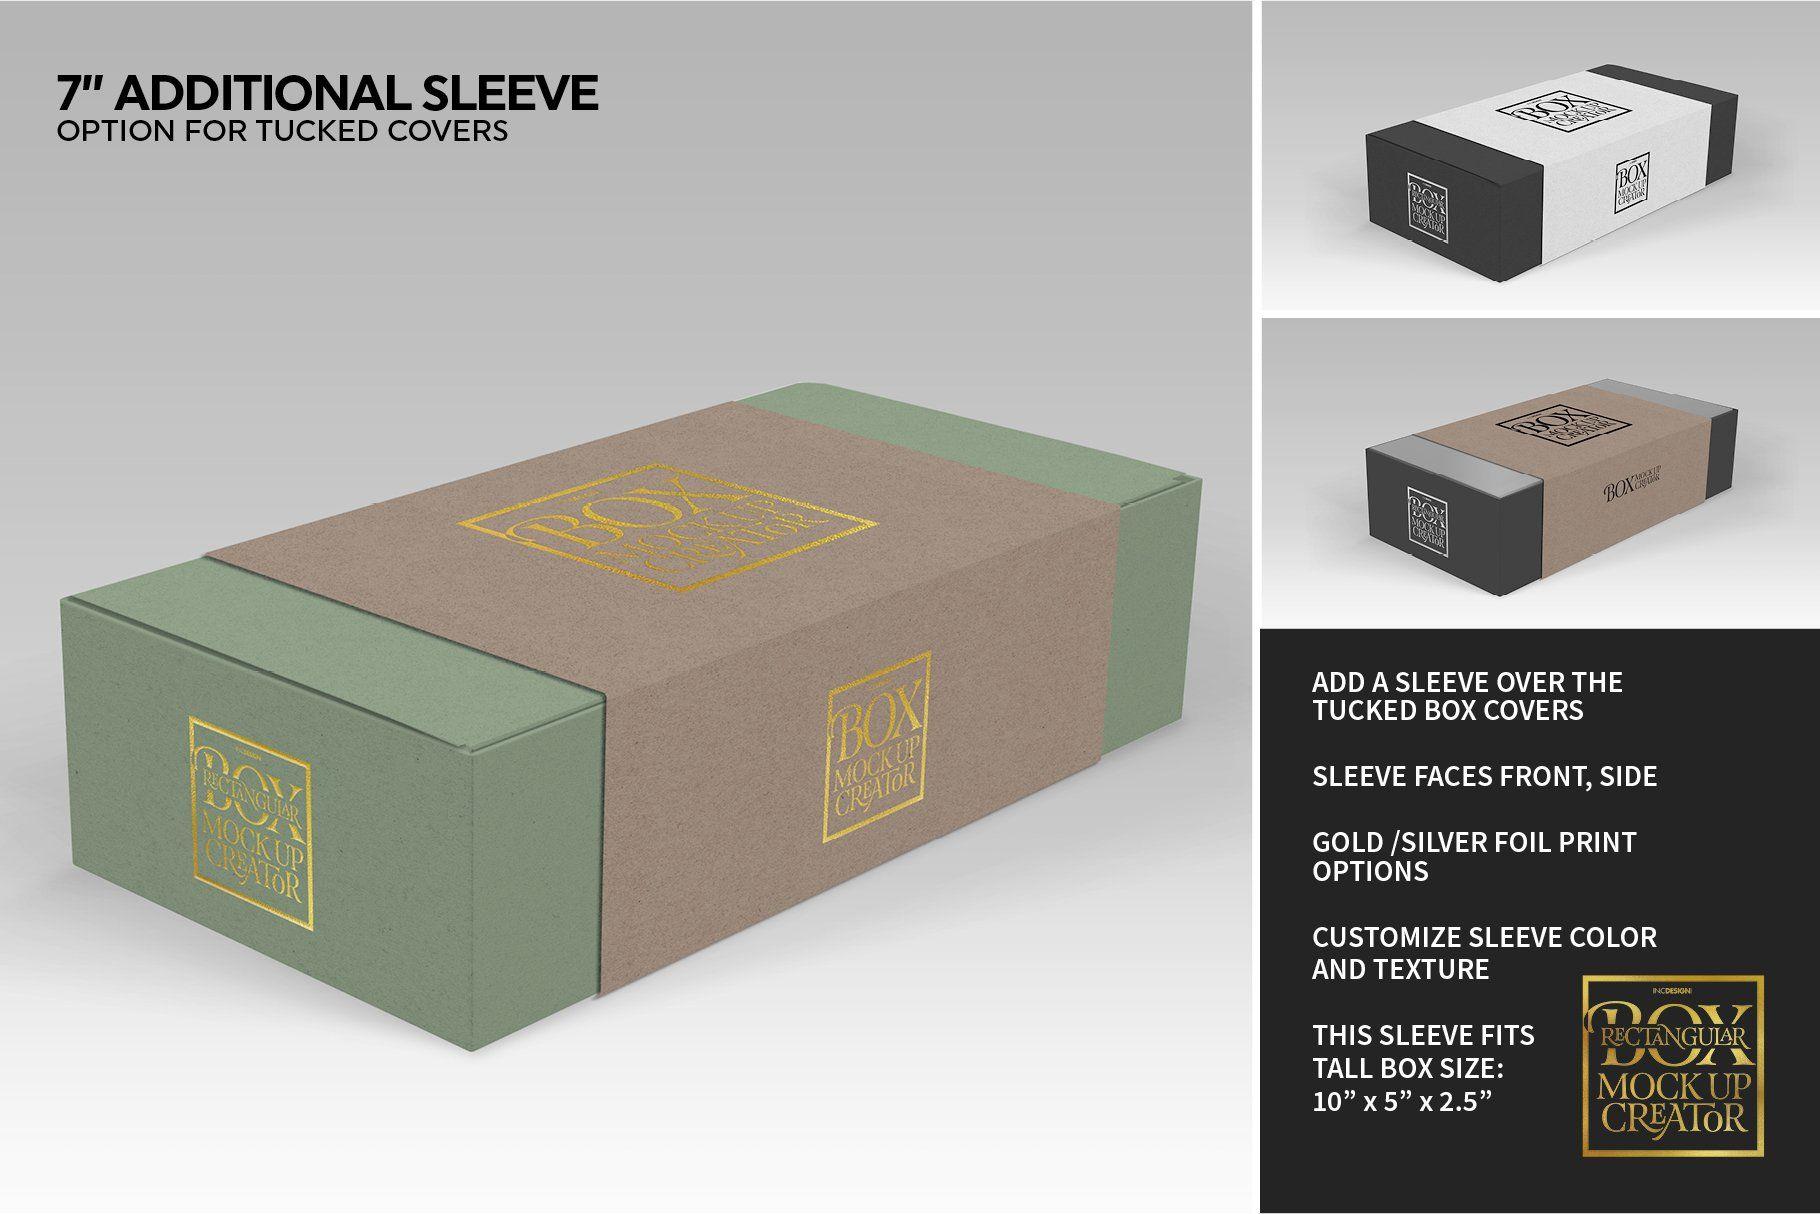 Rectangular Box Mock Up Creator Branding Template Mocking The Creator